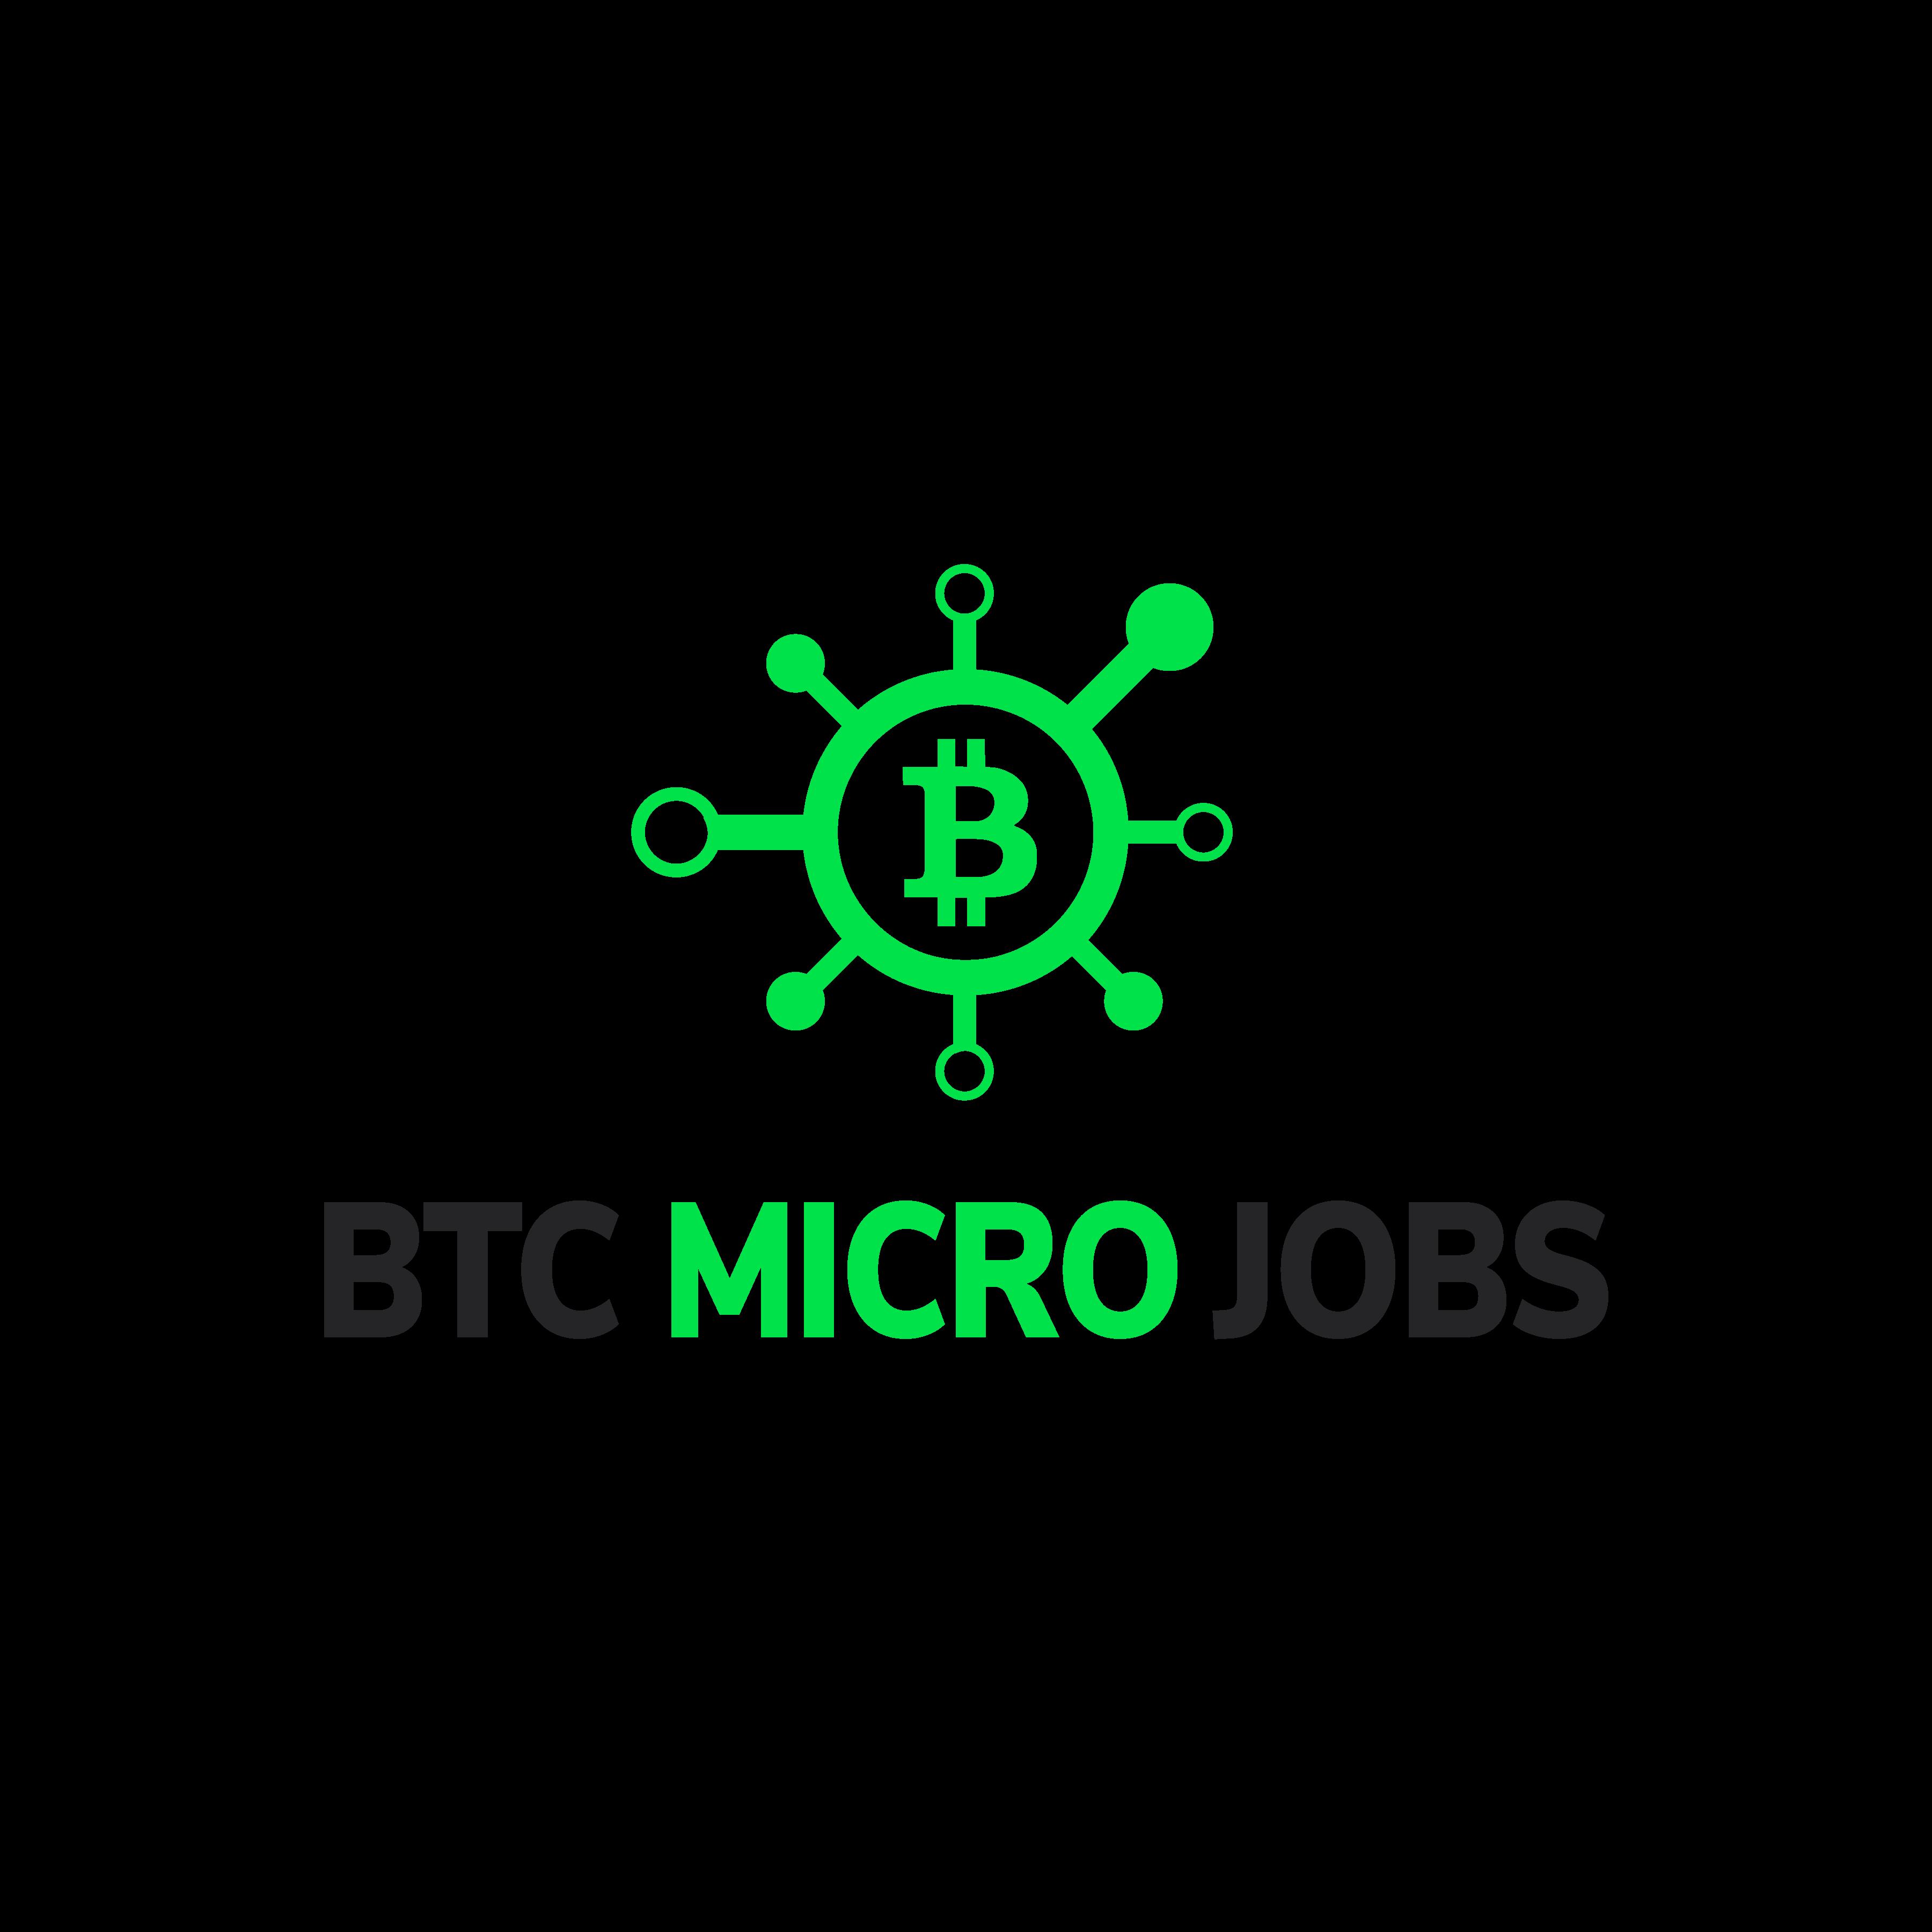 BTC Micro Jobs logo